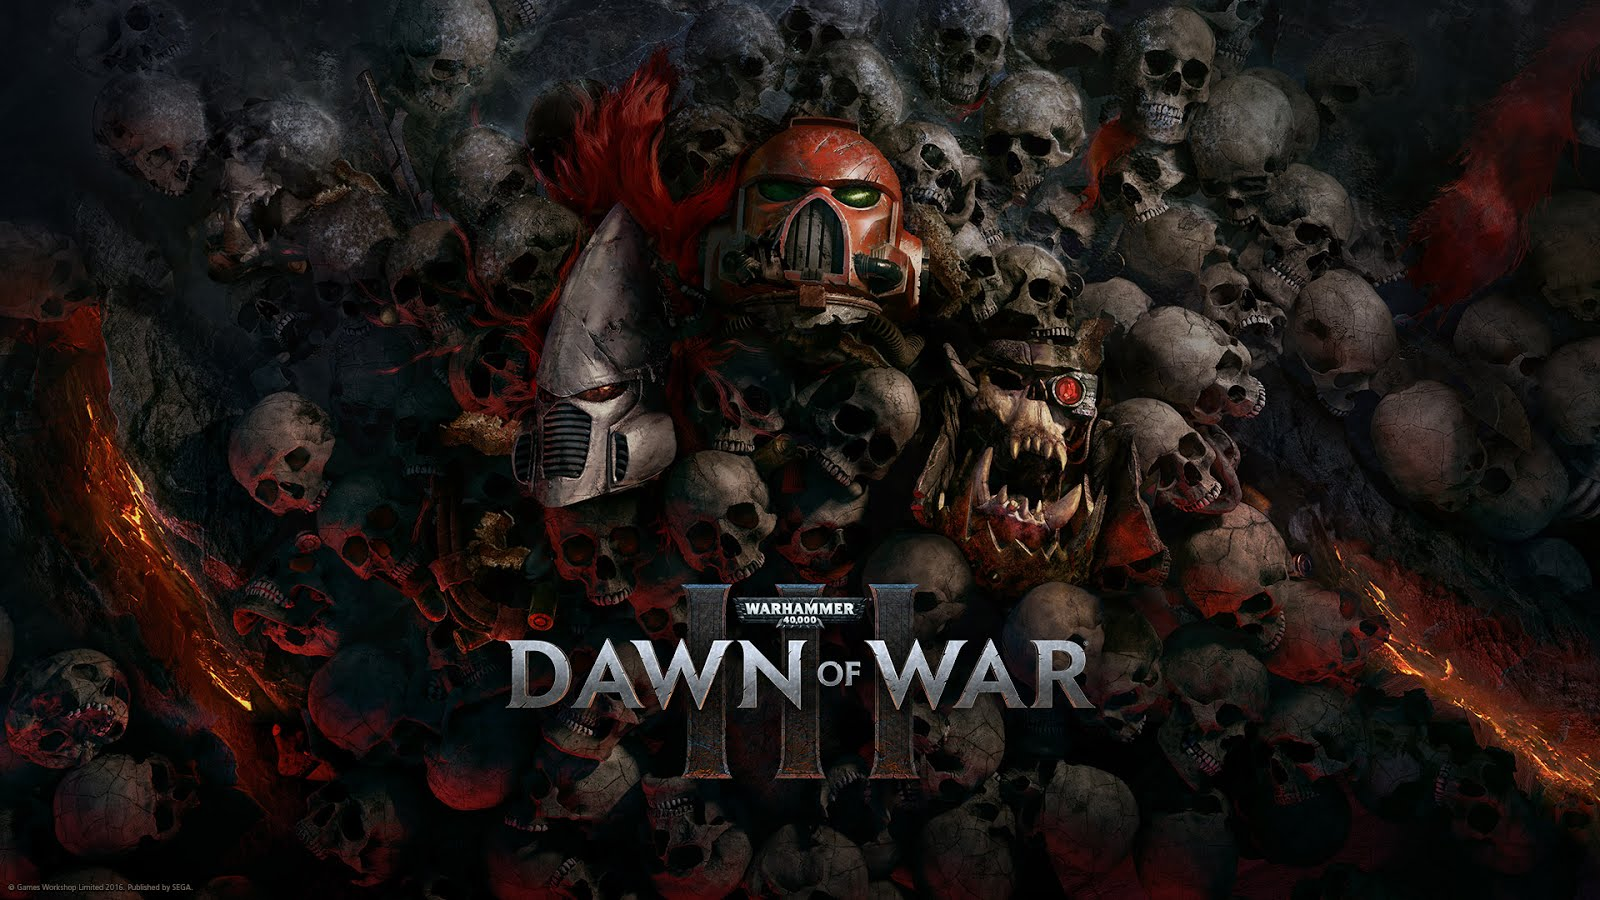 A Look Inside Dawn of War 3